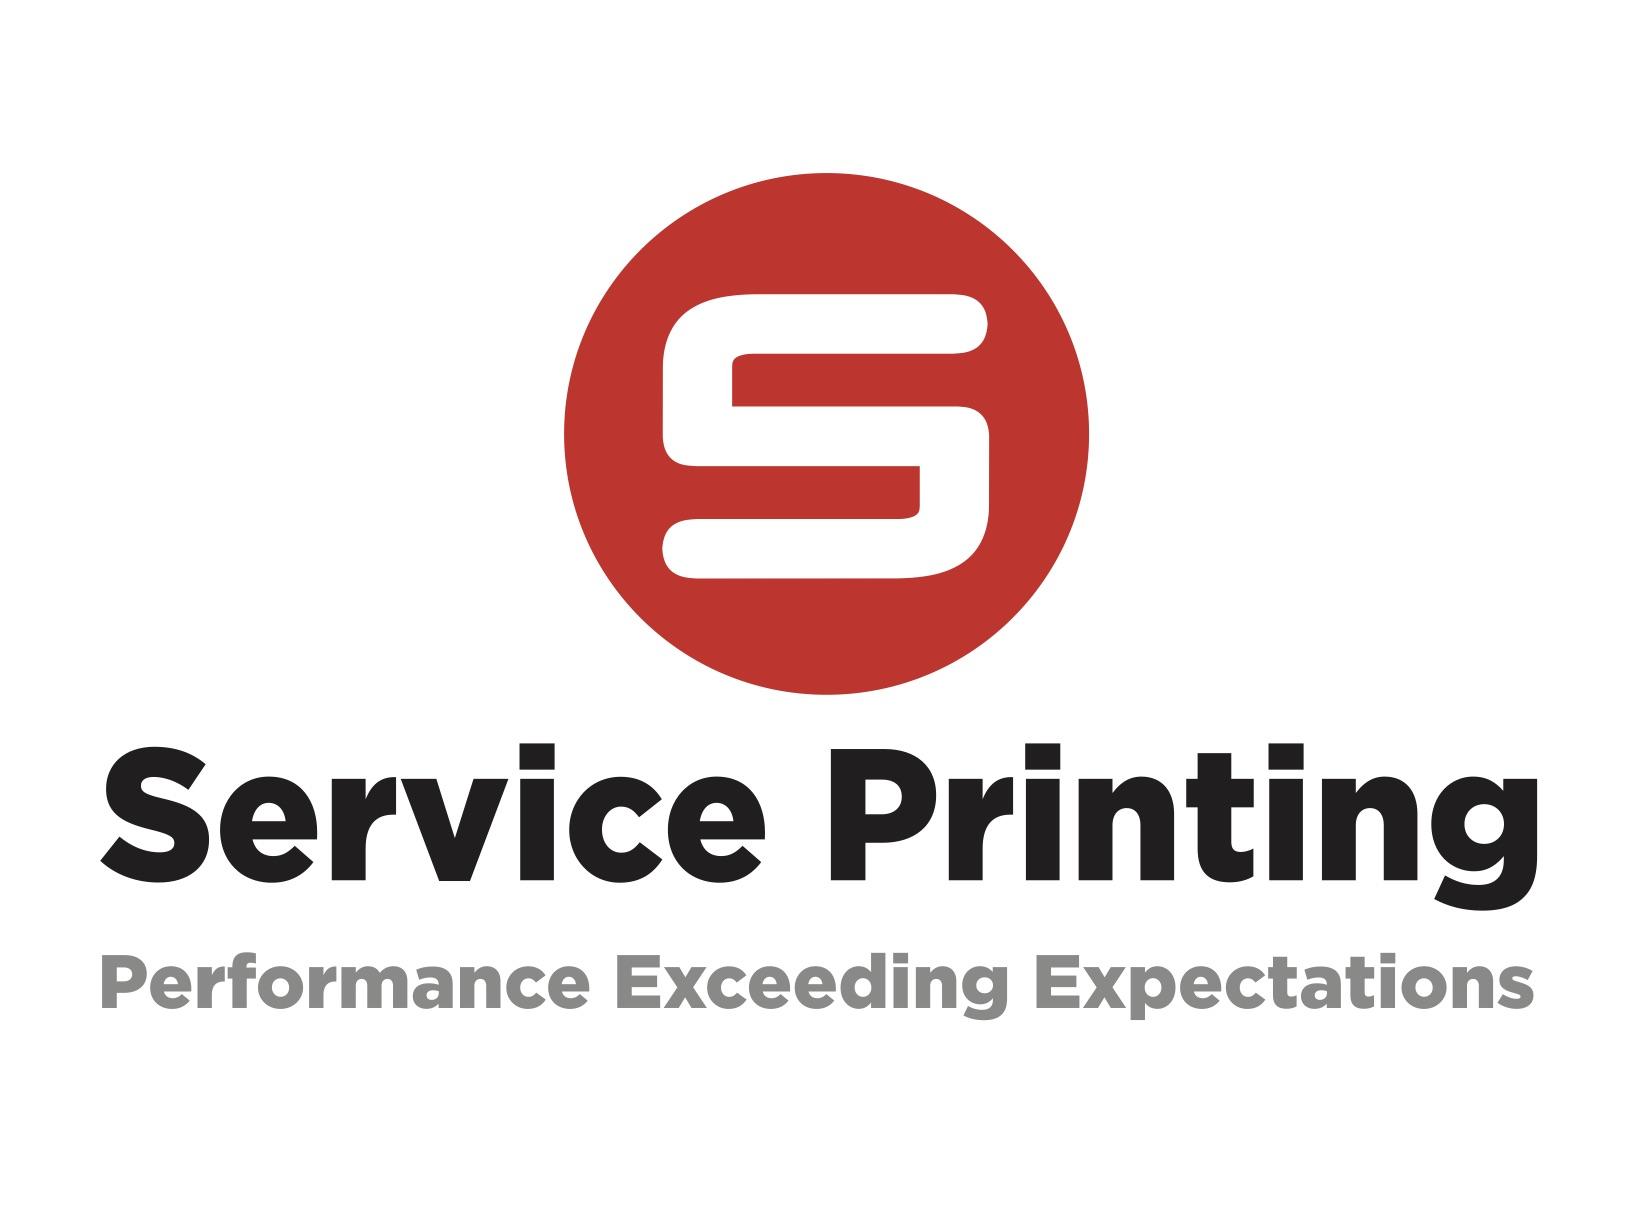 Service Printing